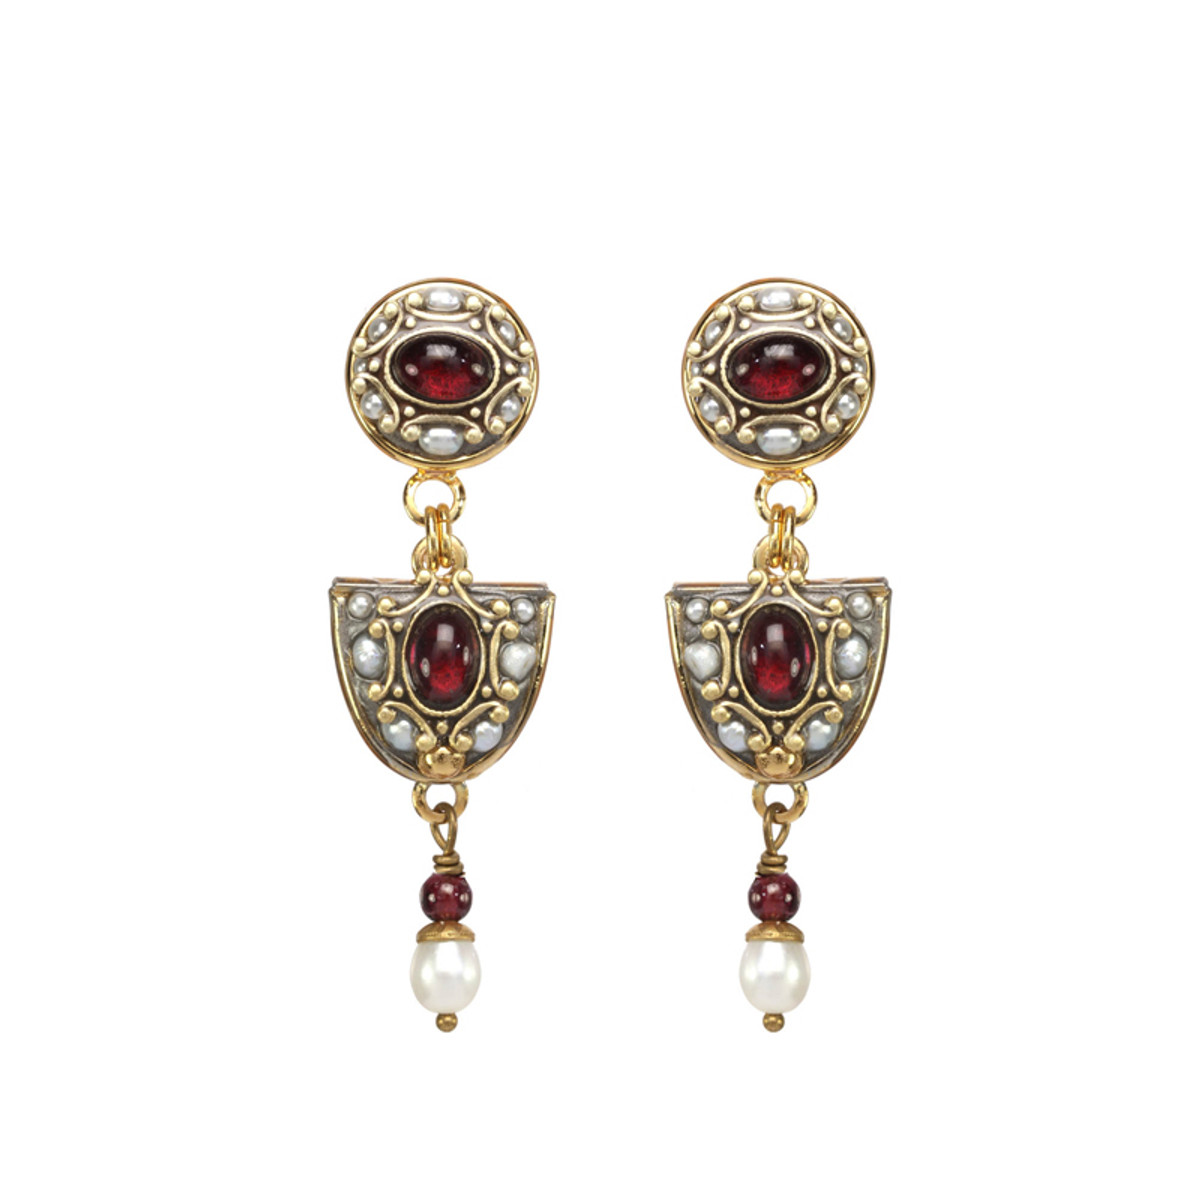 Michal Golan Victorian Arch Dangle Earrings